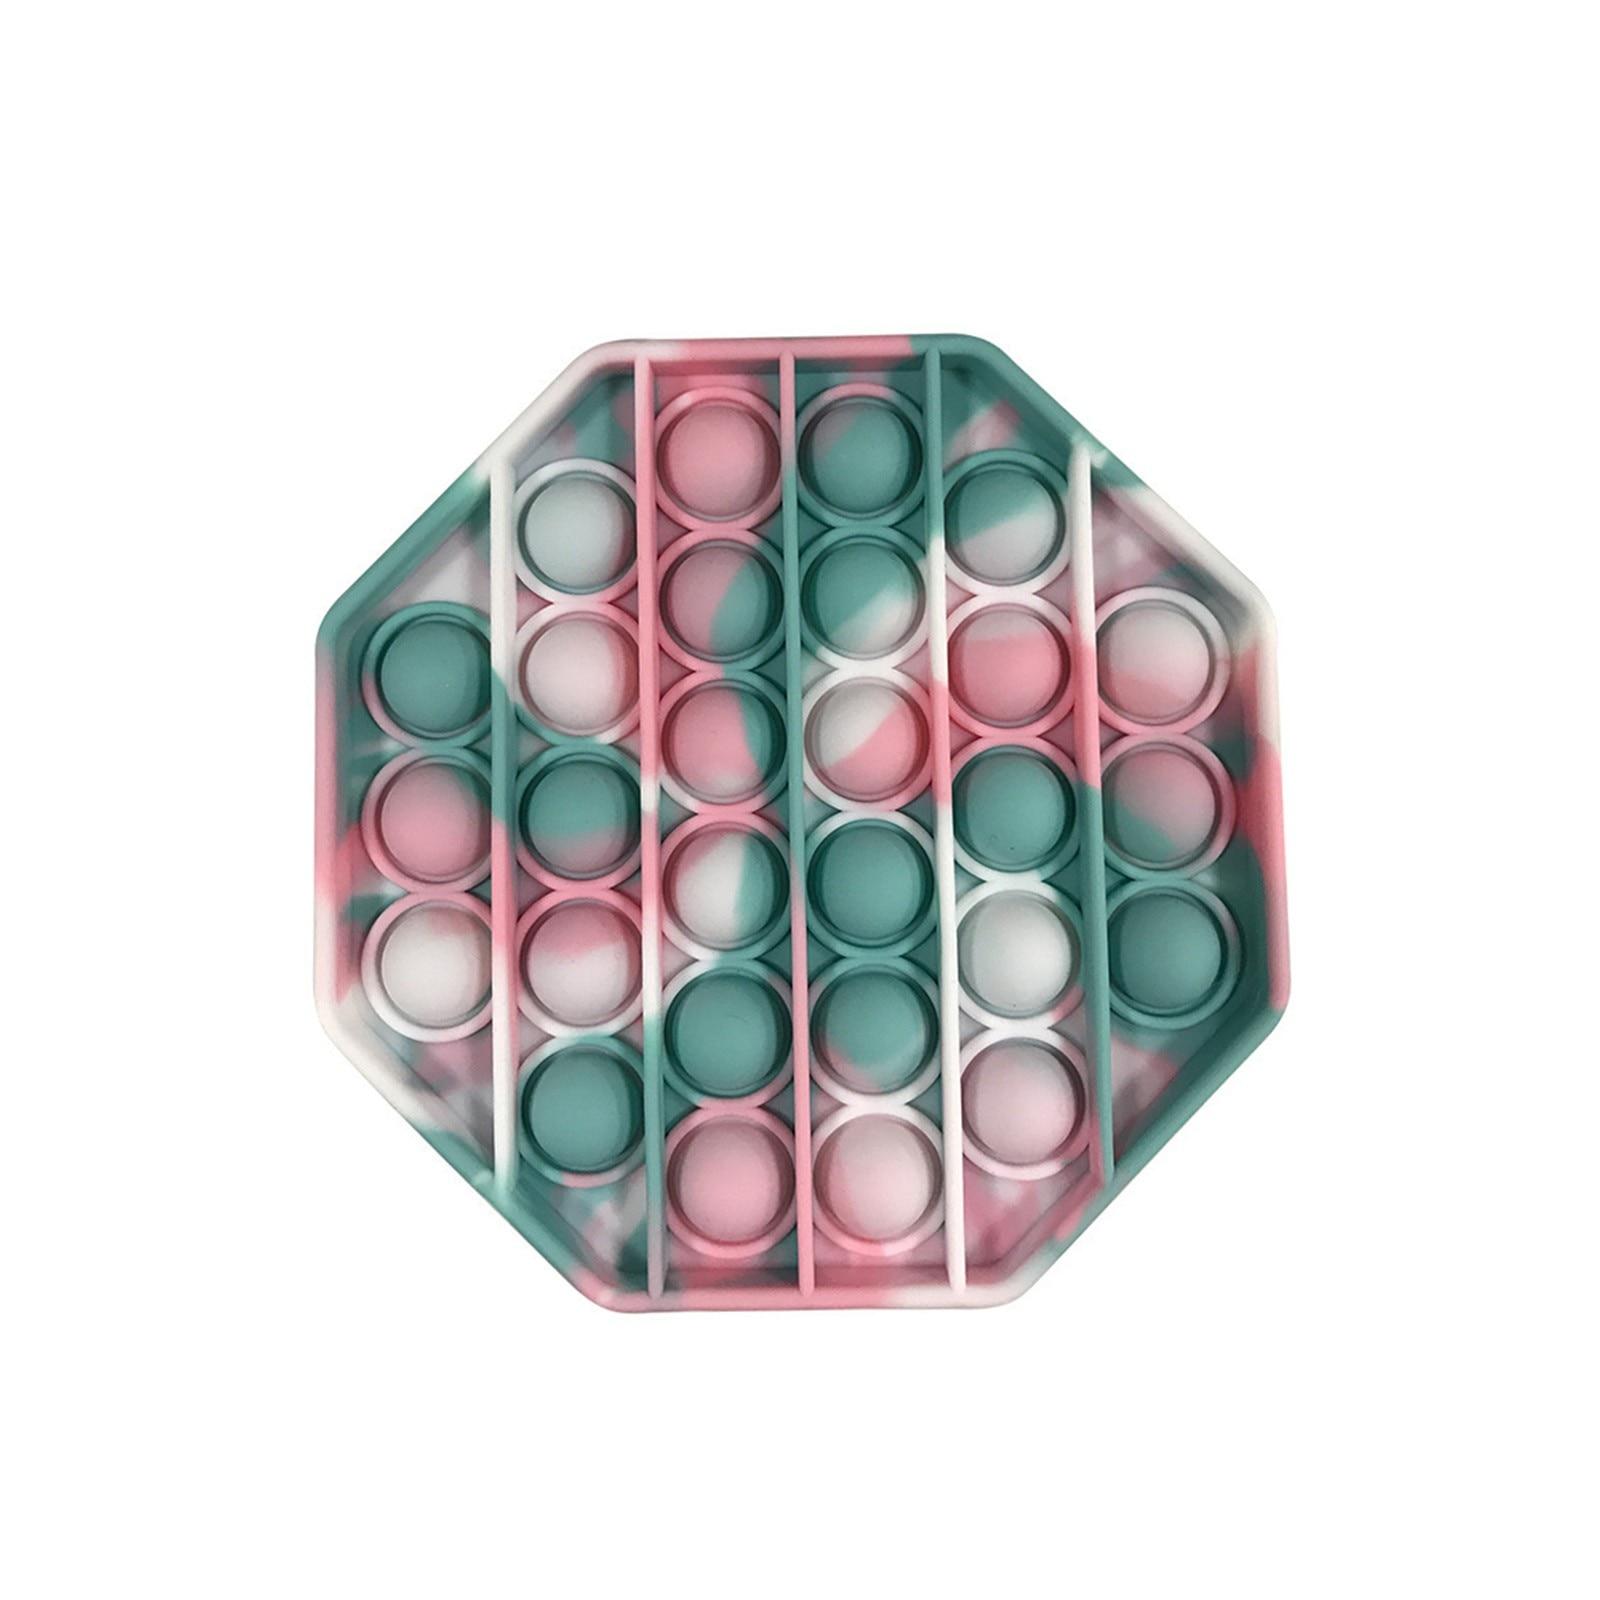 PopIt Hot Push Bubble Fidget Toys Adult Stress Relief Toy Antistress PopIt Soft Squishy Anti-Stress Gift Anti Stress Box ??? ??* img2